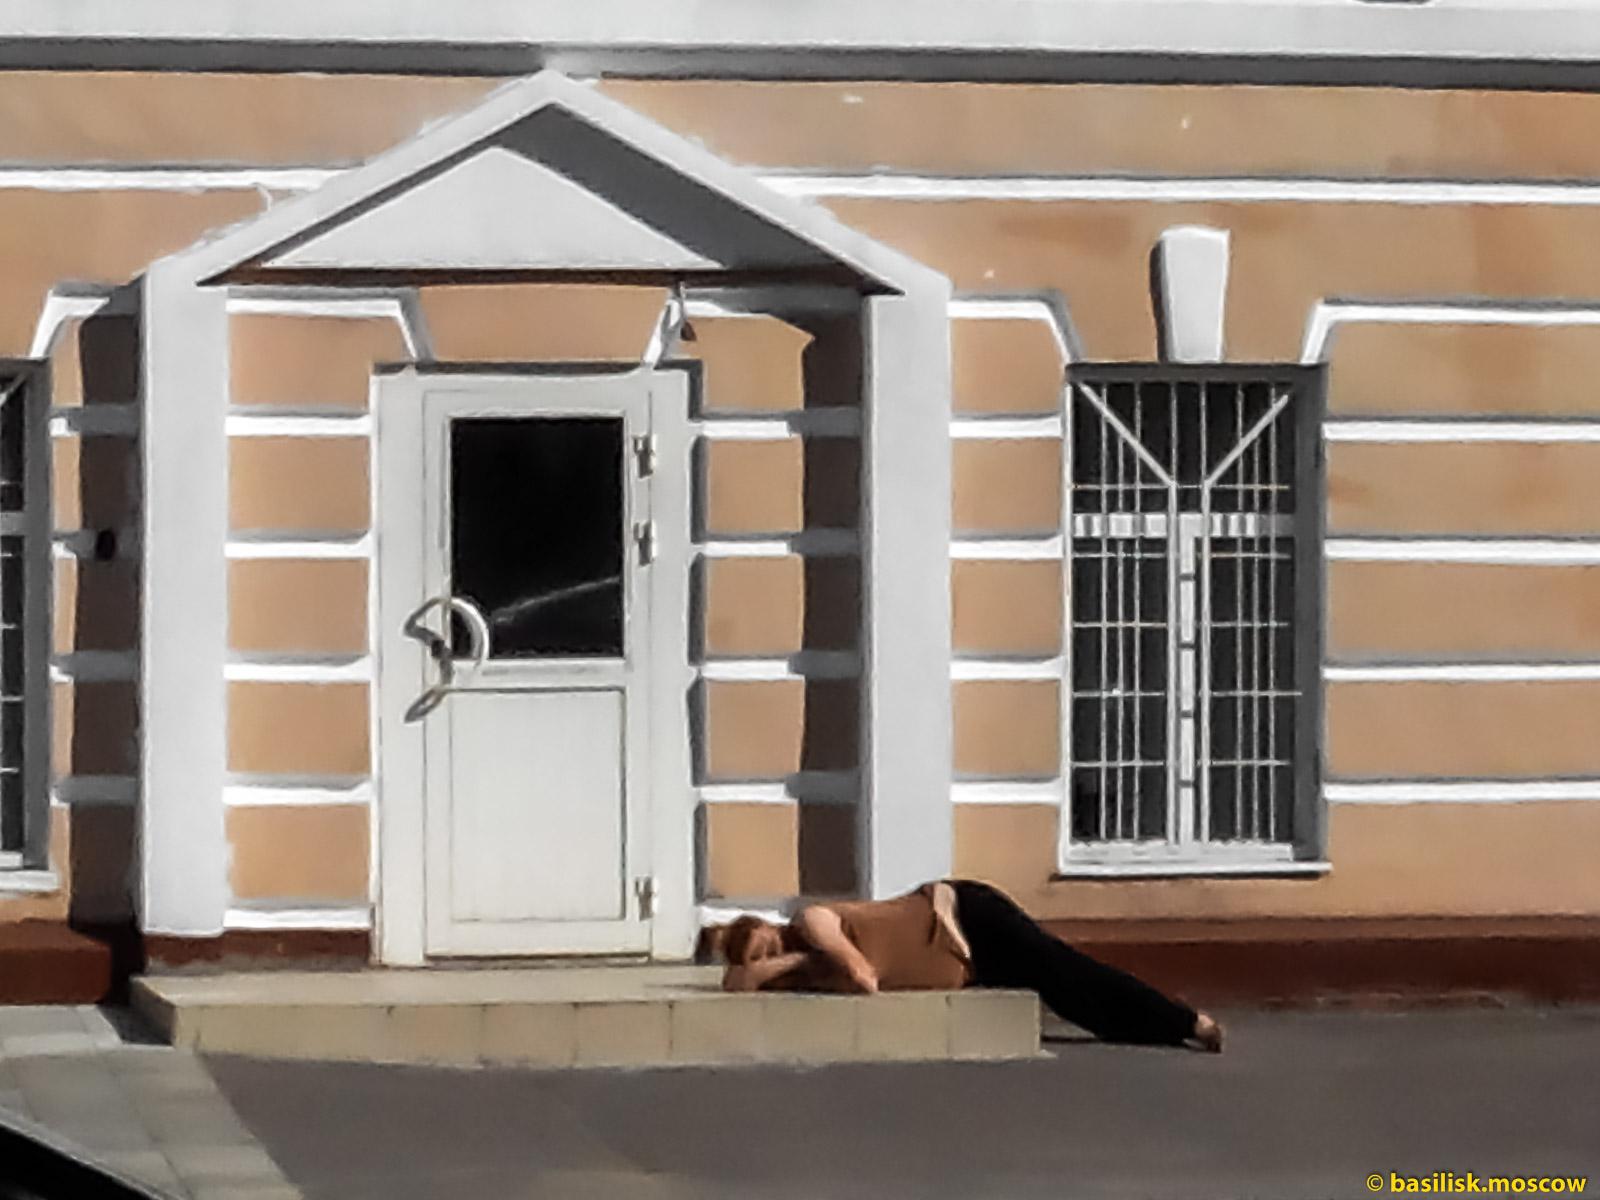 Москвичка отдыхает. Москва. Июль 2017